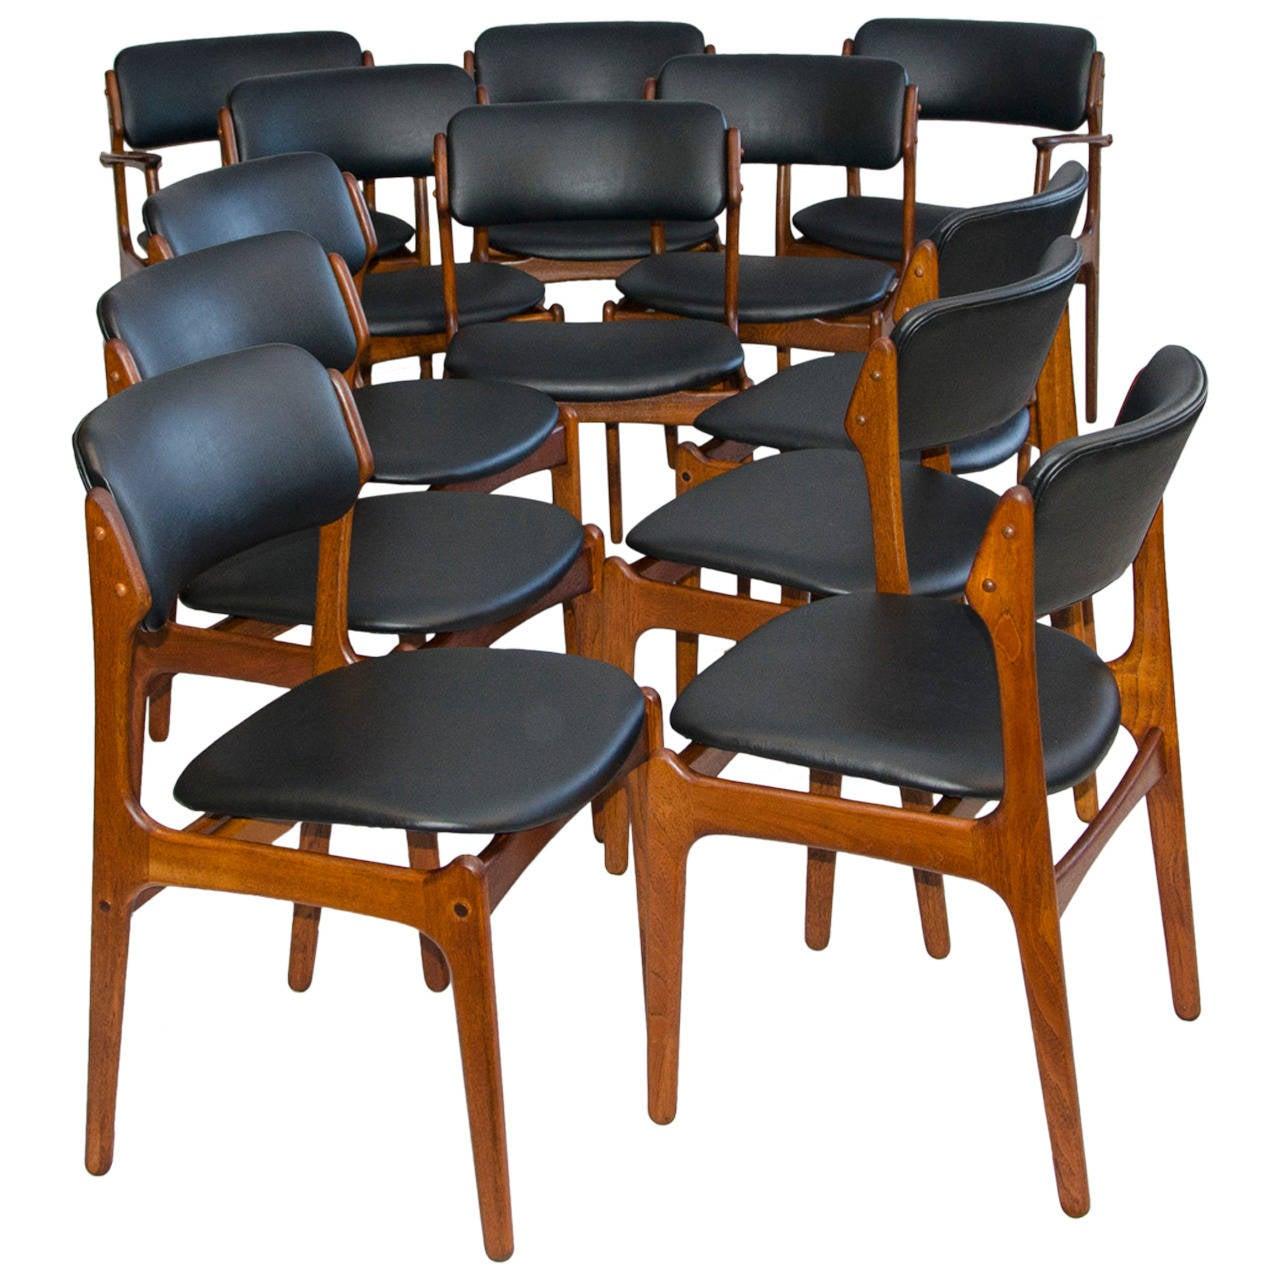 erik buck chairs swing chair baby best set of 12 danish teak dining by at 1stdibs